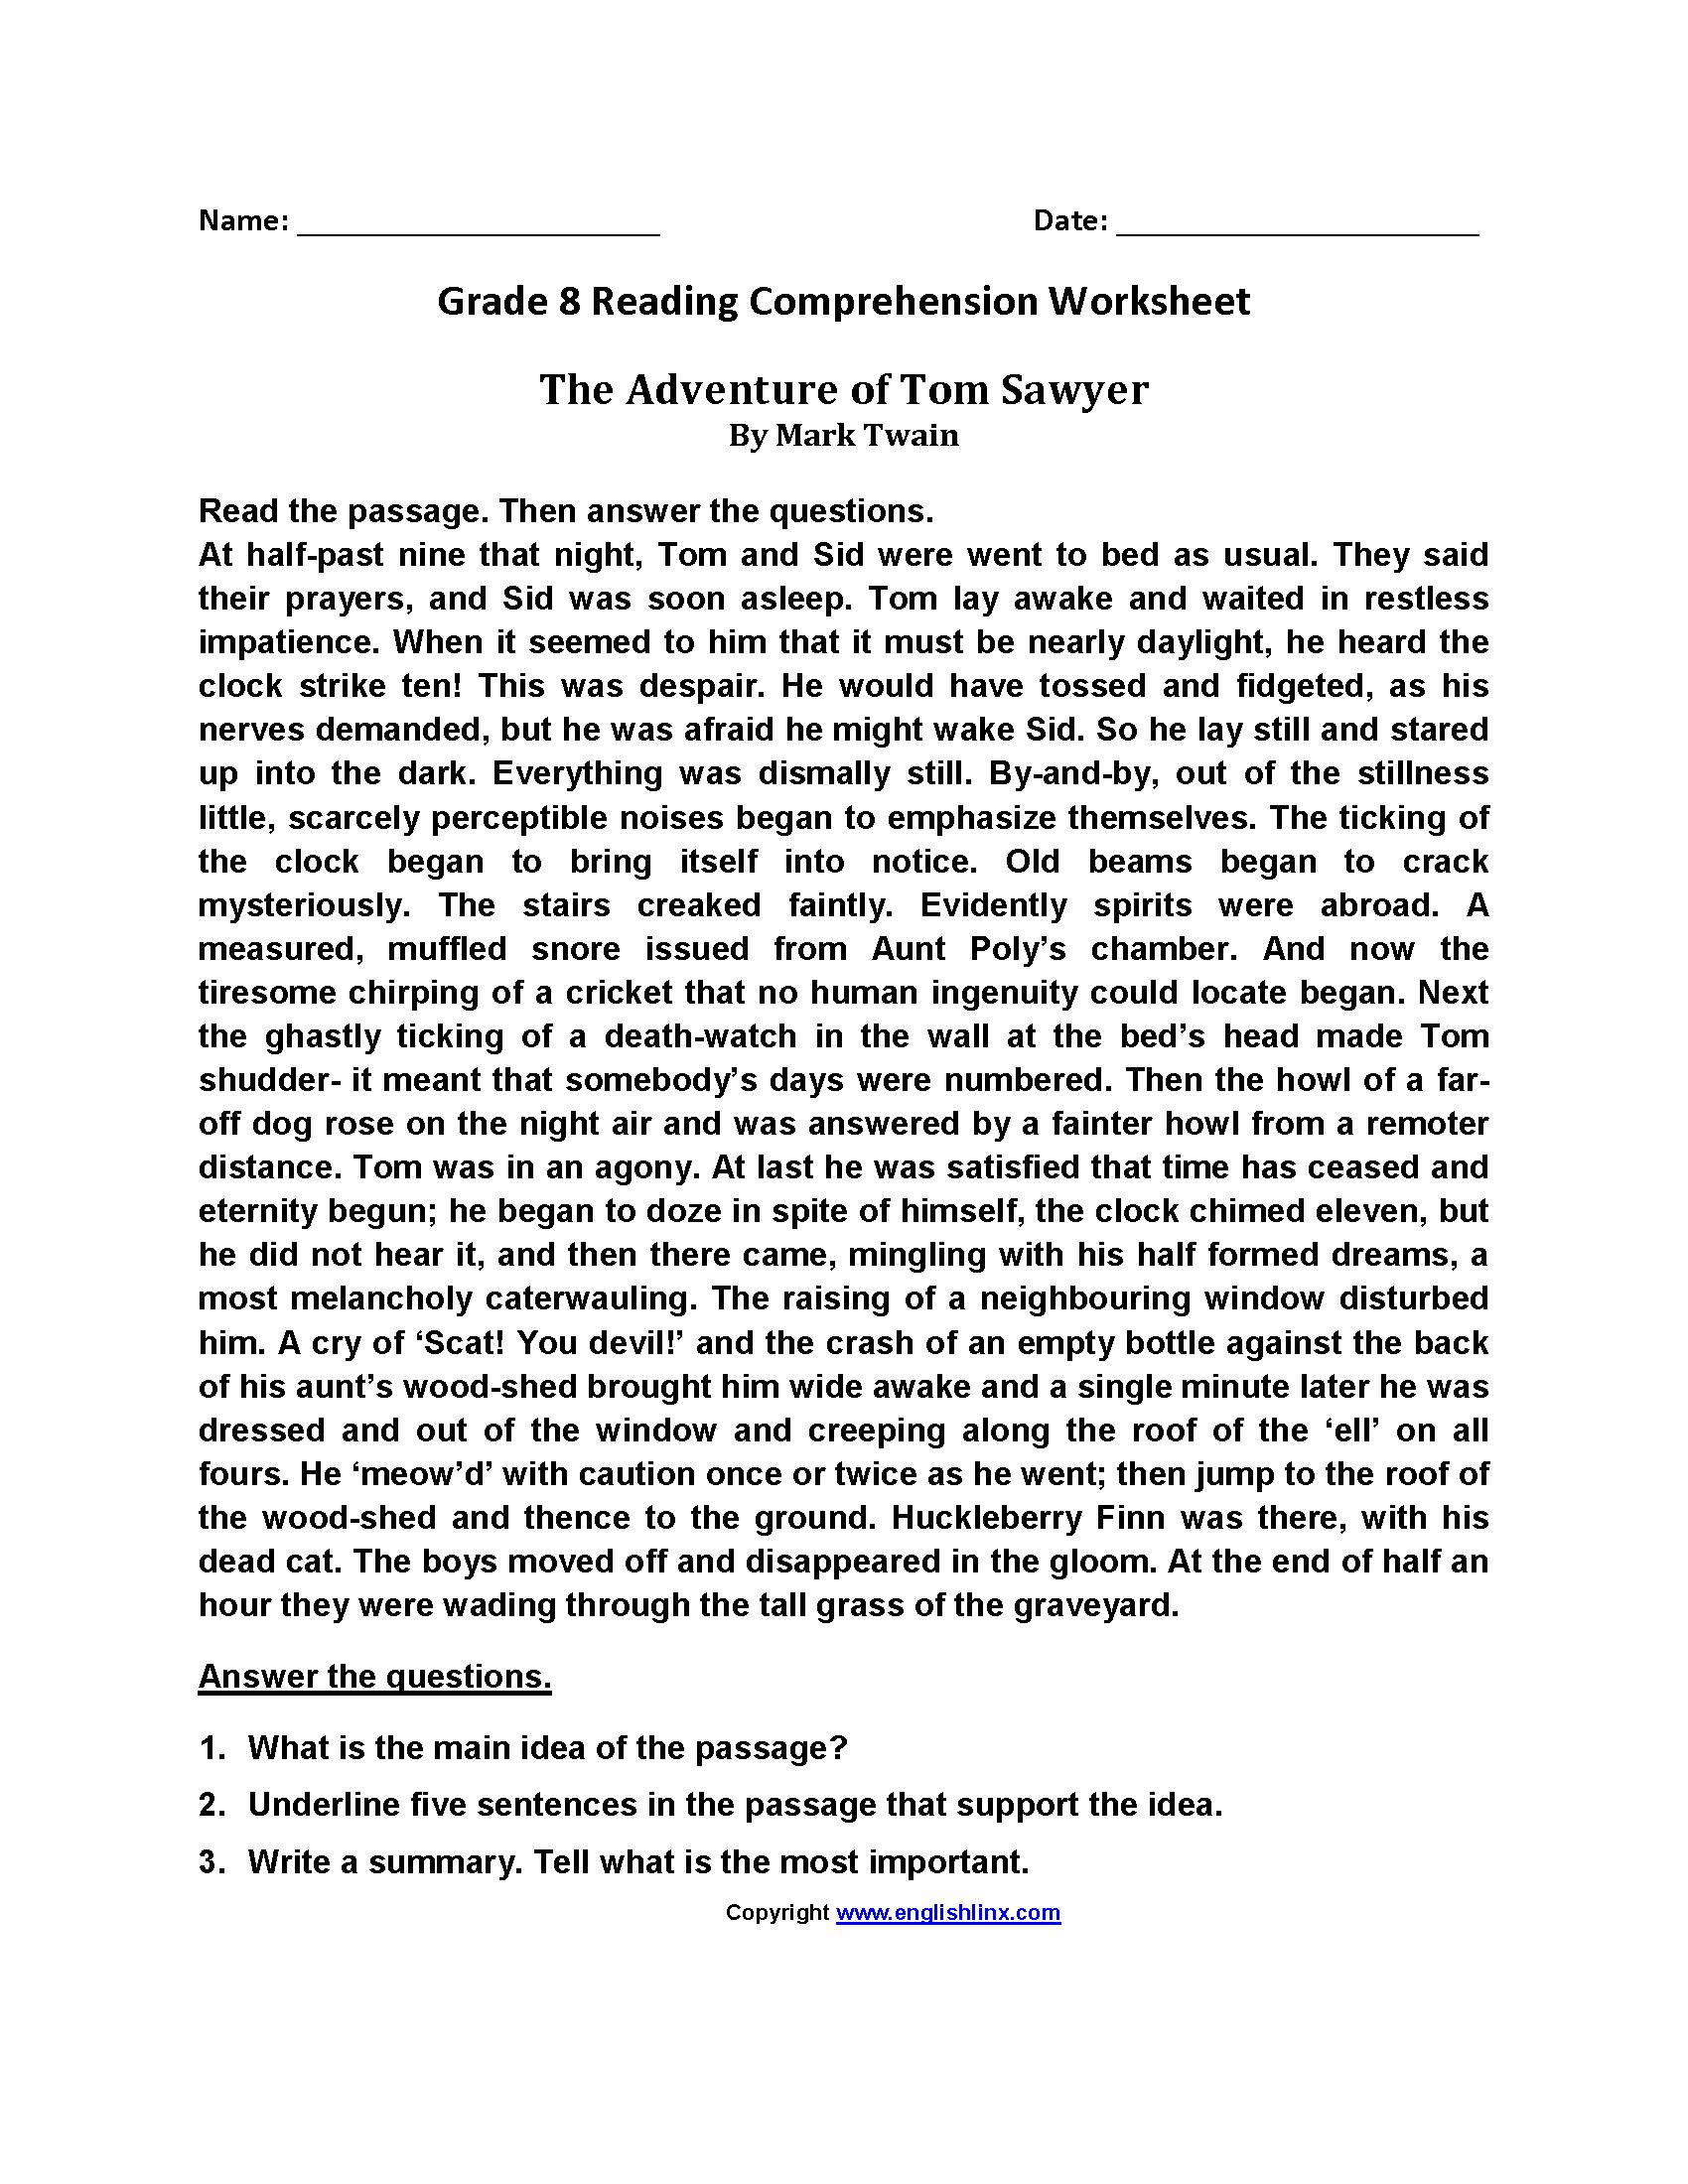 Reading Comprehension Worksheets for 8th Grade Free and Reading Worksheets Eighth Grade Reading Worksheets